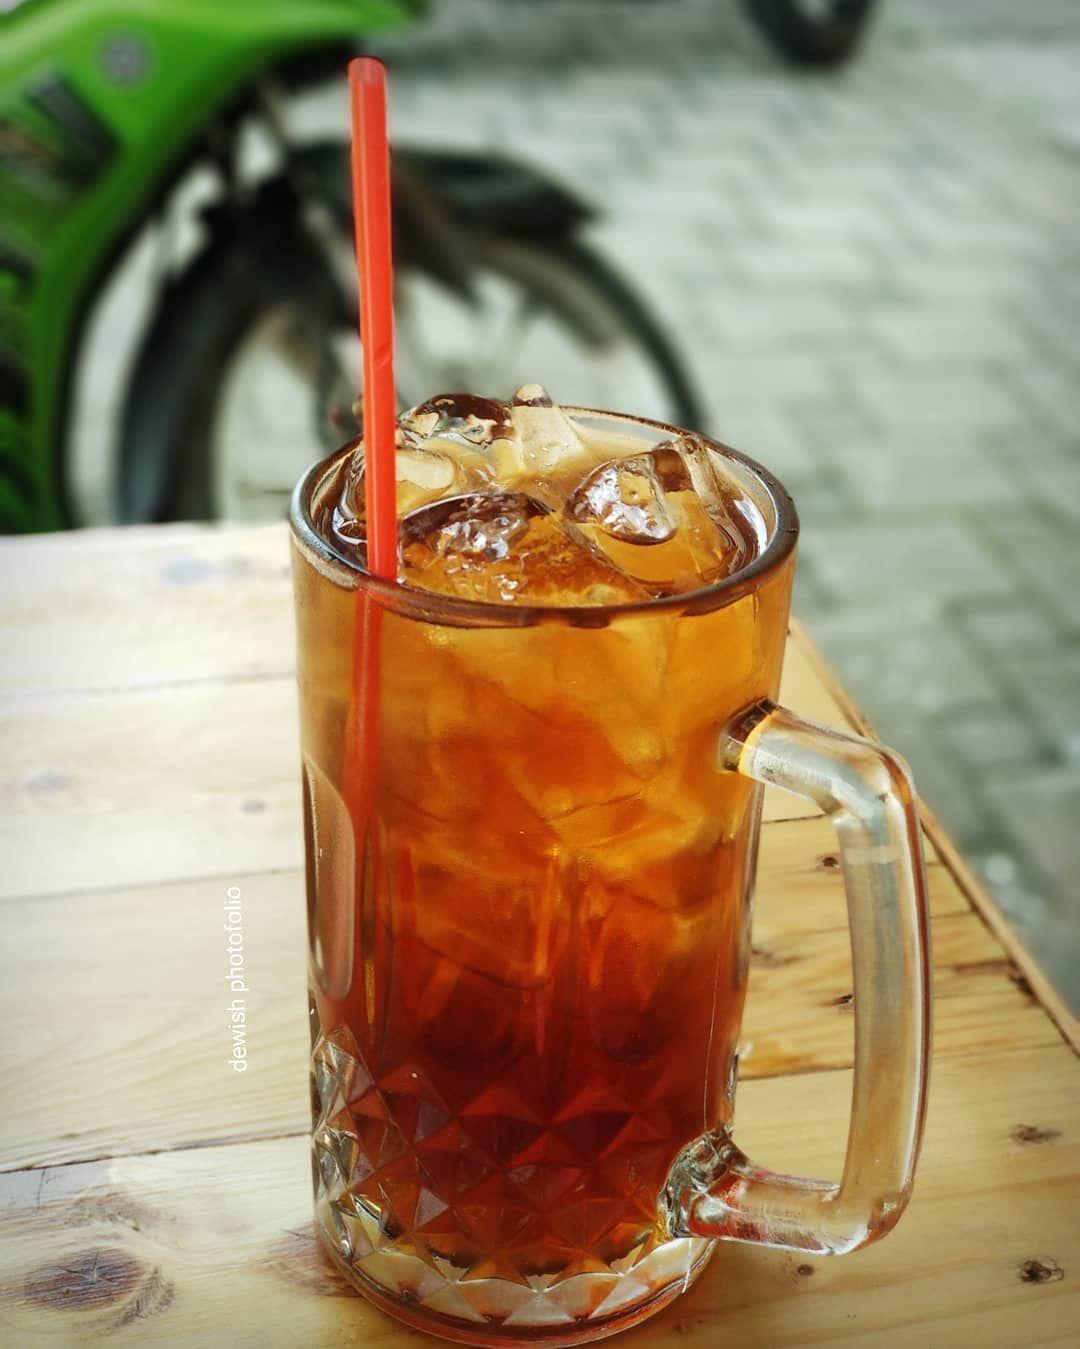 Dewi Sh Di Instagram Es Teh Manis Dilihat Doang Udah Bikin Seger Apalagi Kalau Udah Diminum Estehmanis Icetea Minuman Min Teh Es Es Teh Teh Manis